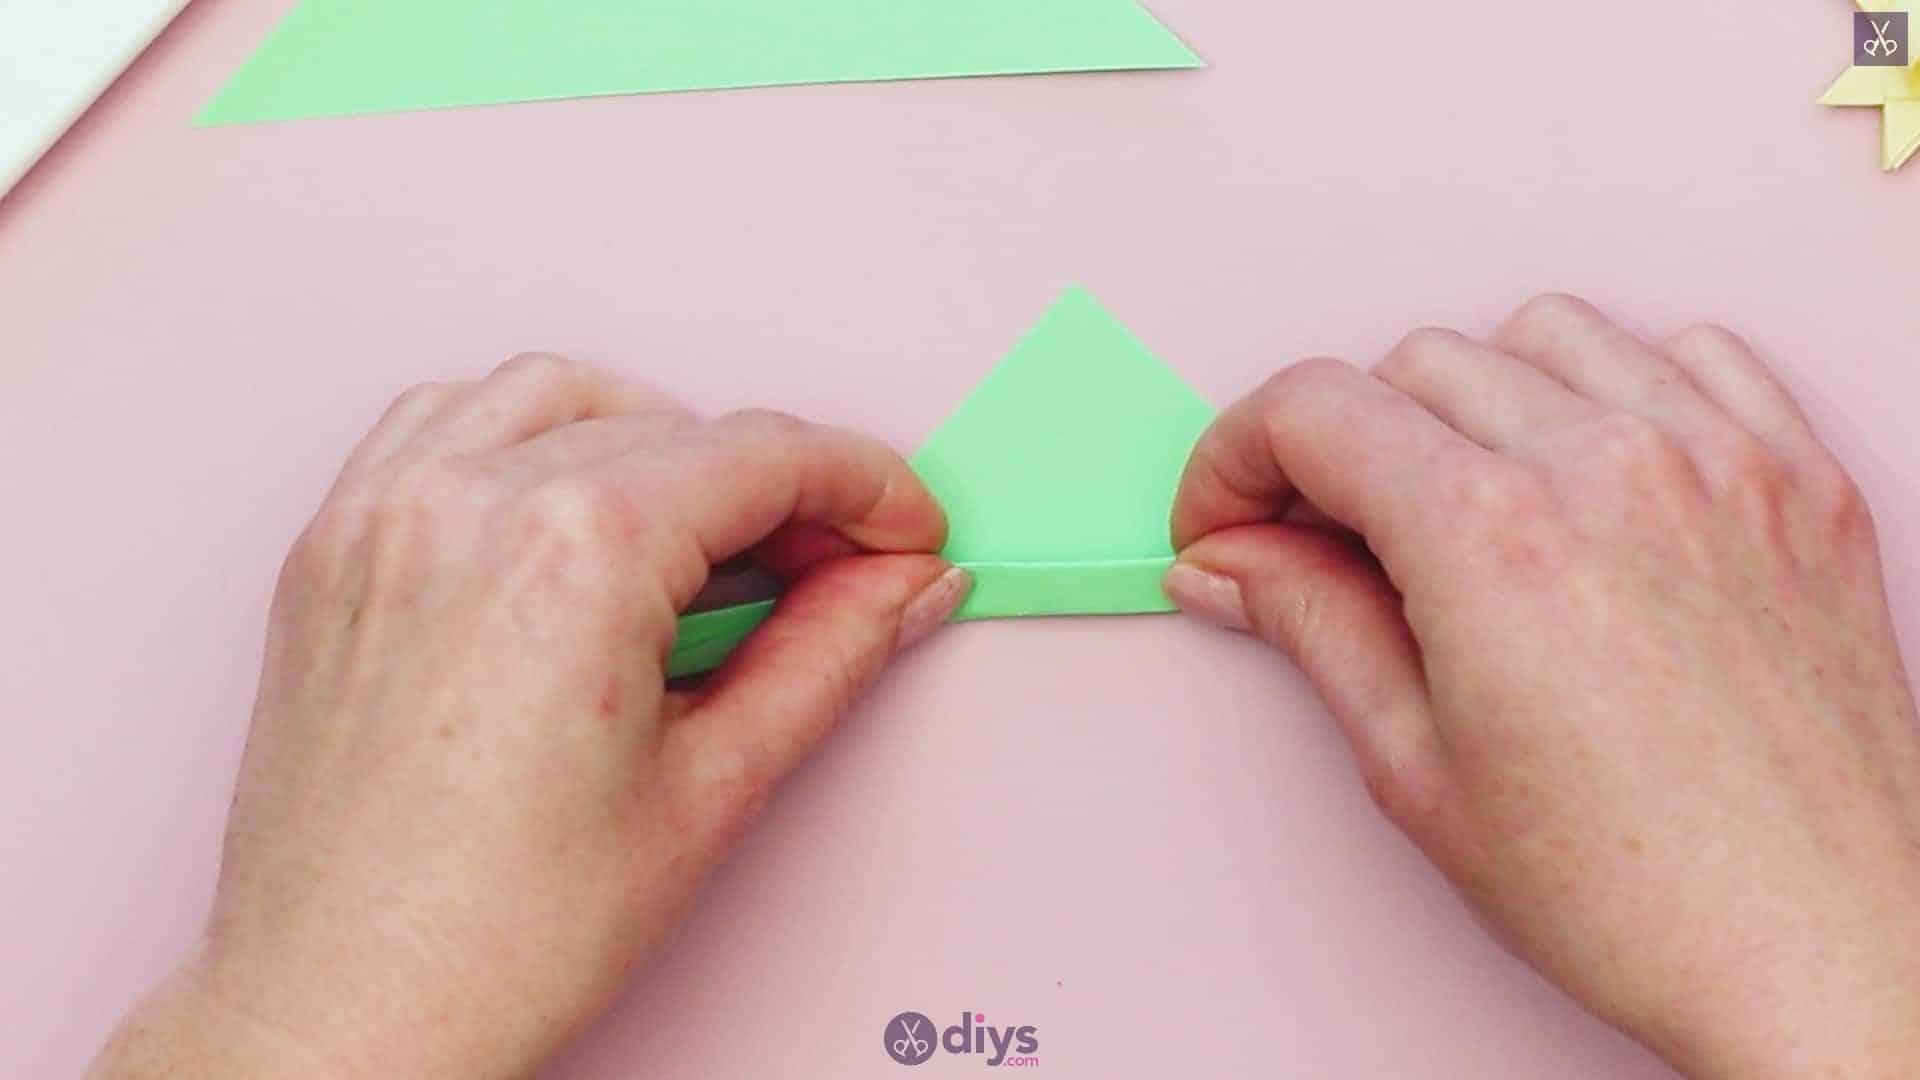 Diy origami flower art step 10